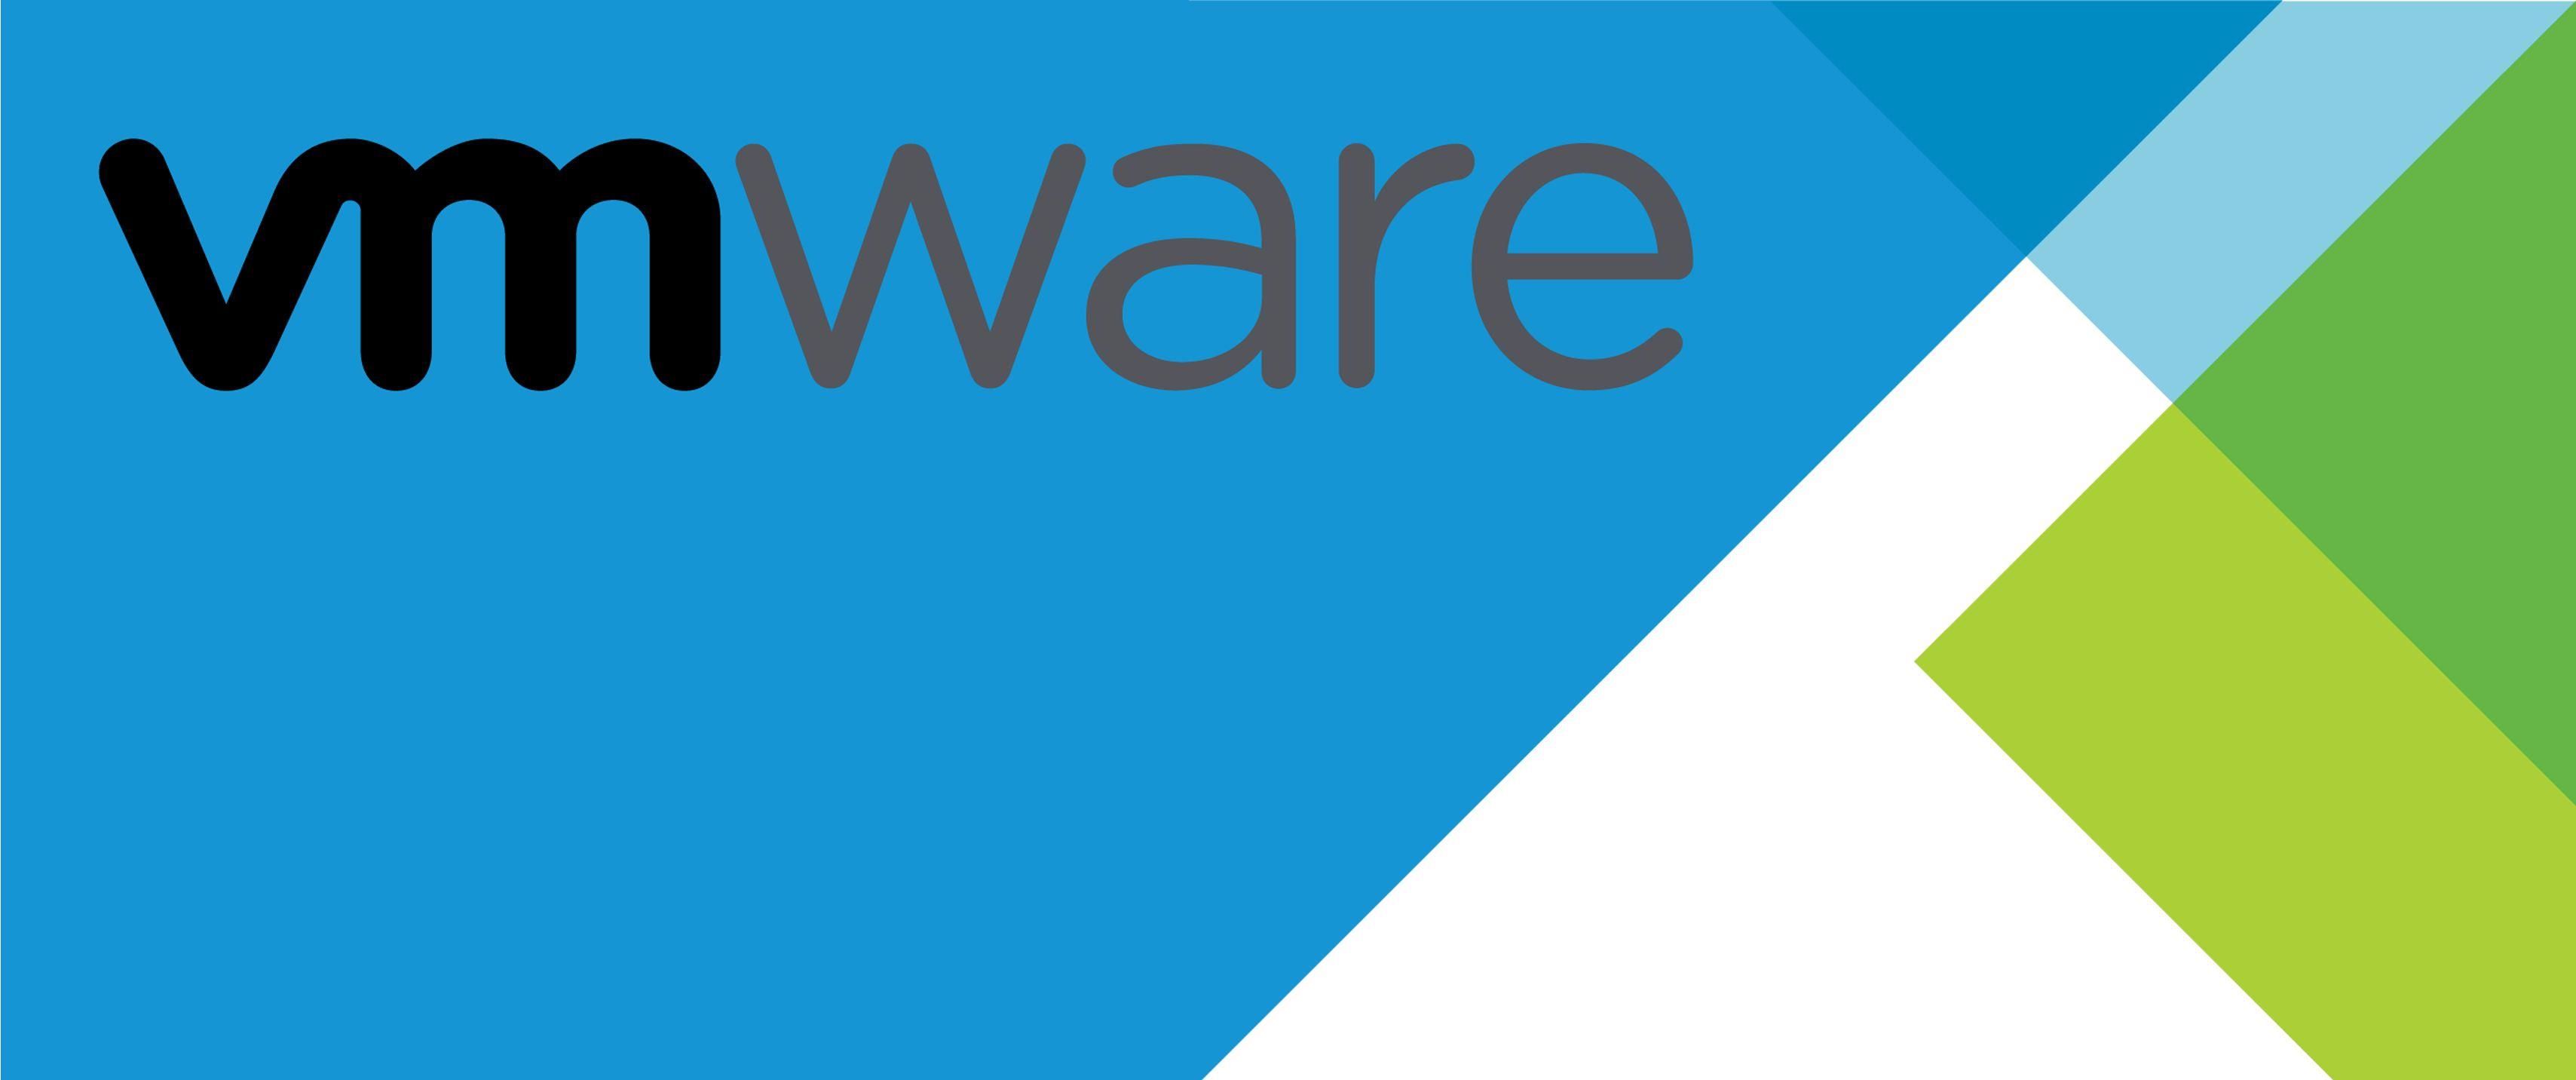 VMware Workstation Pro 15中文破解版15.0.1 Build 10737736 带激活密钥和激活软件 / 附带绿色版免安装版 实用软件 第1张